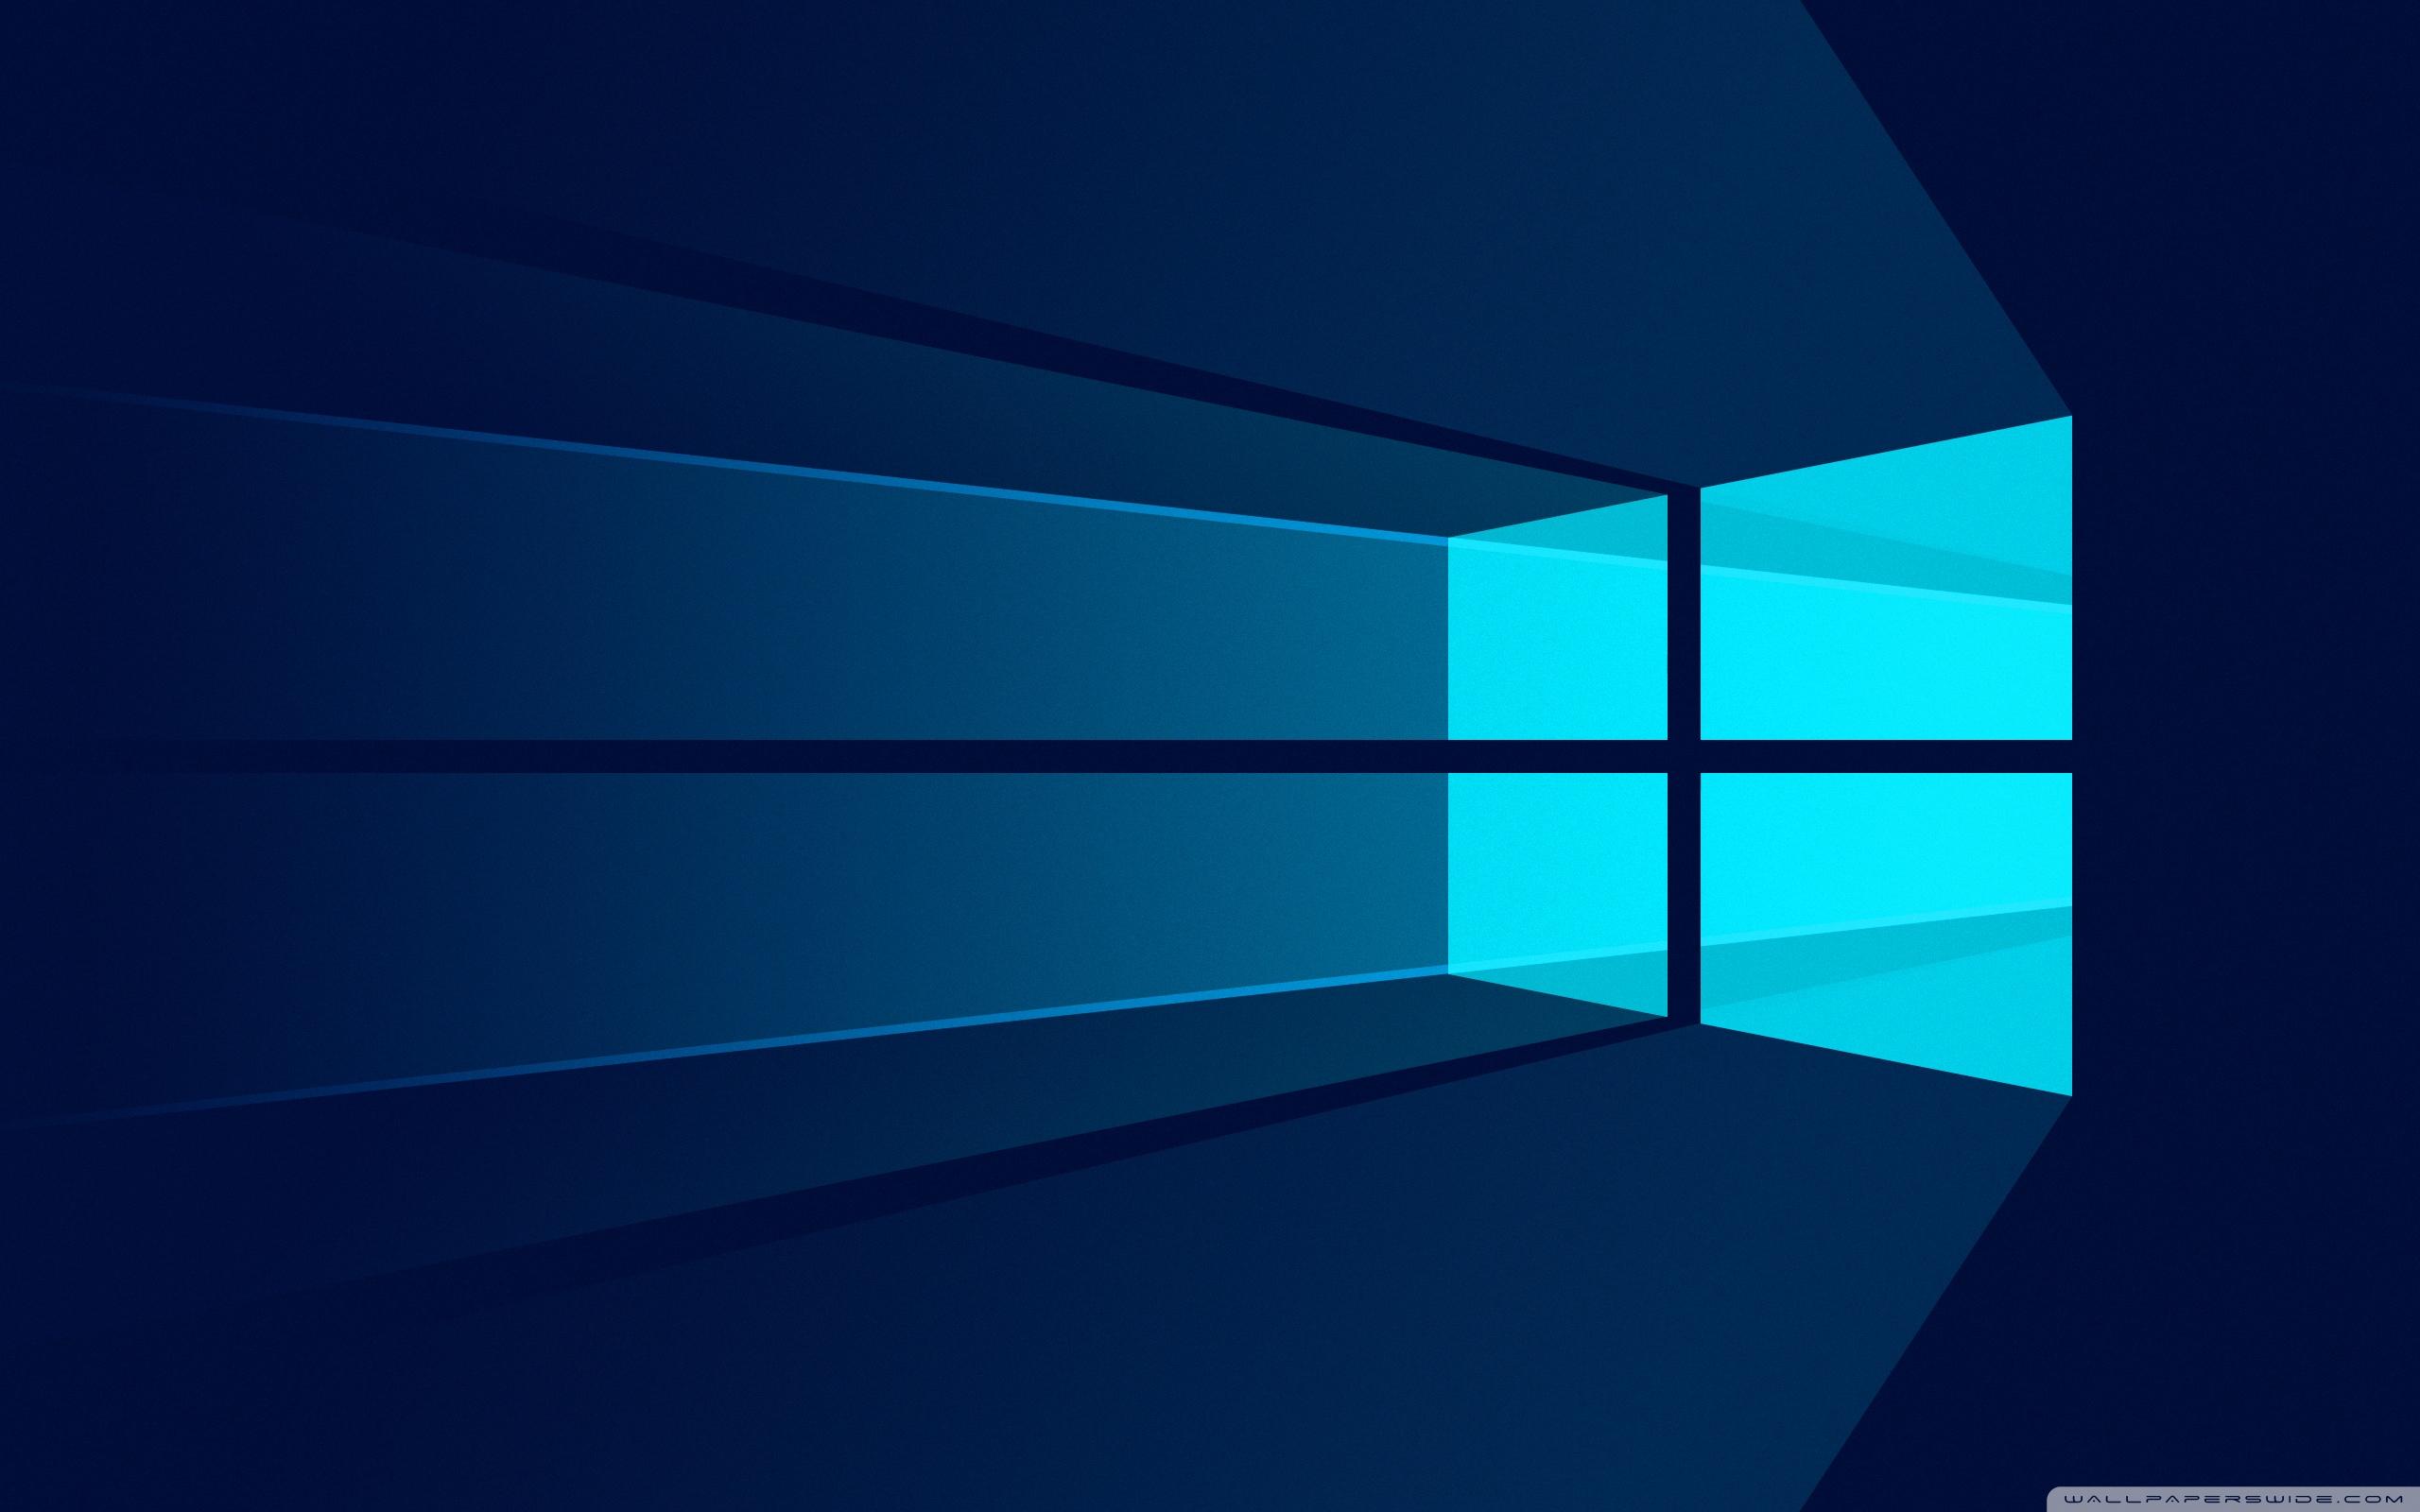 Gambar Wallpaper Untuk Windows 10 Terlengkap  A1